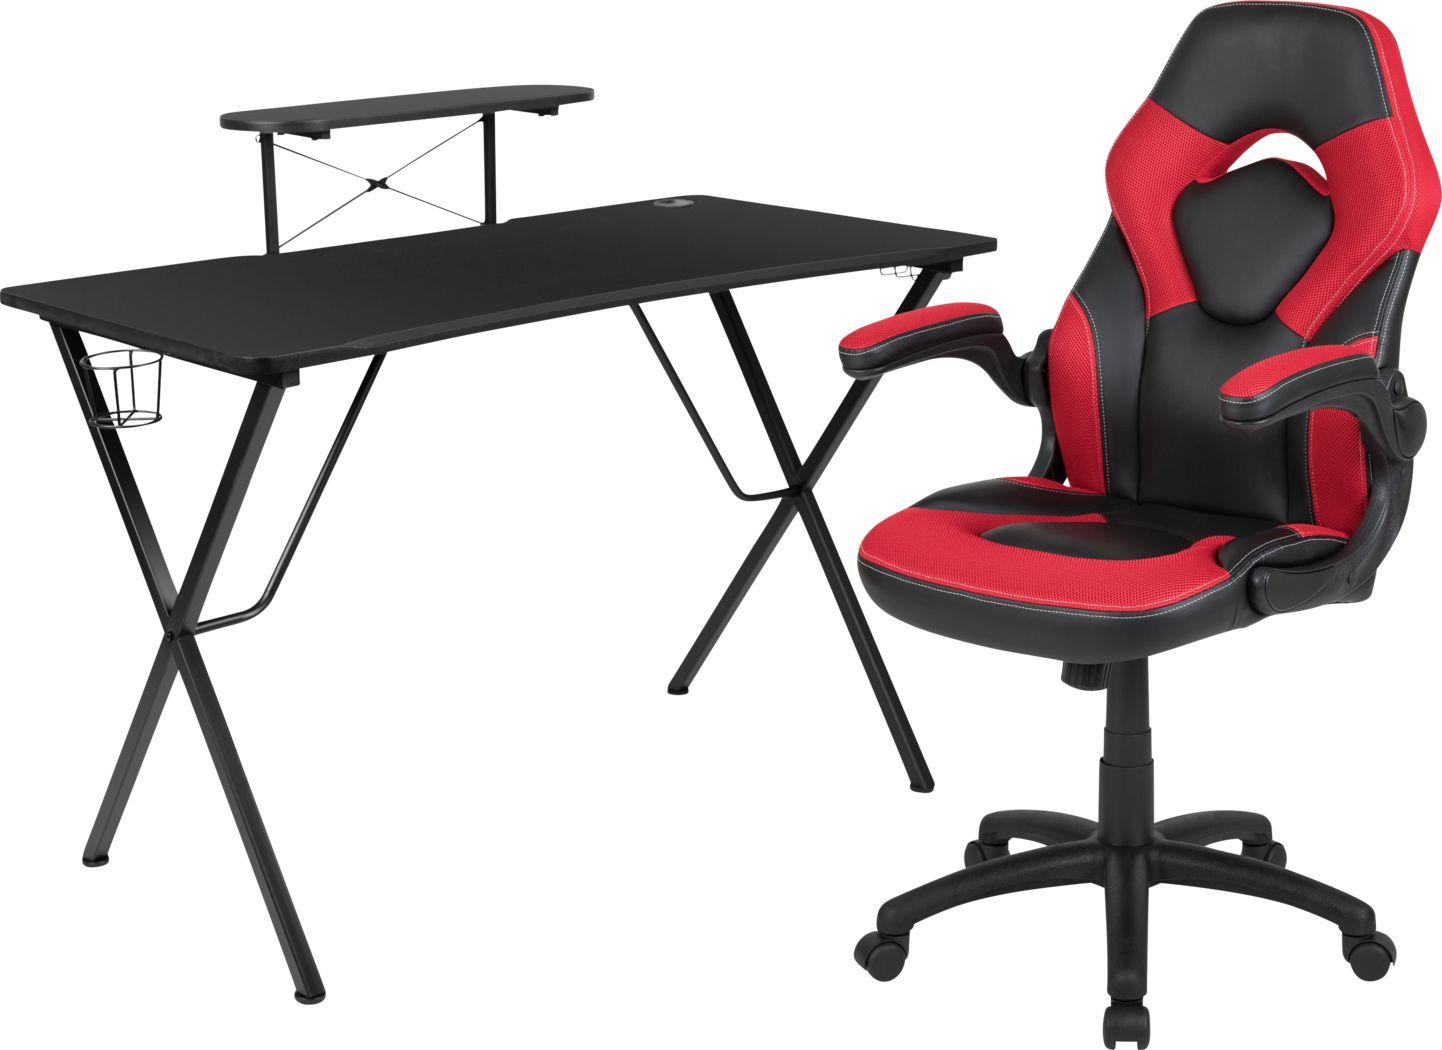 Kids Gerro Black/Red Gaming Desk and Chair Set